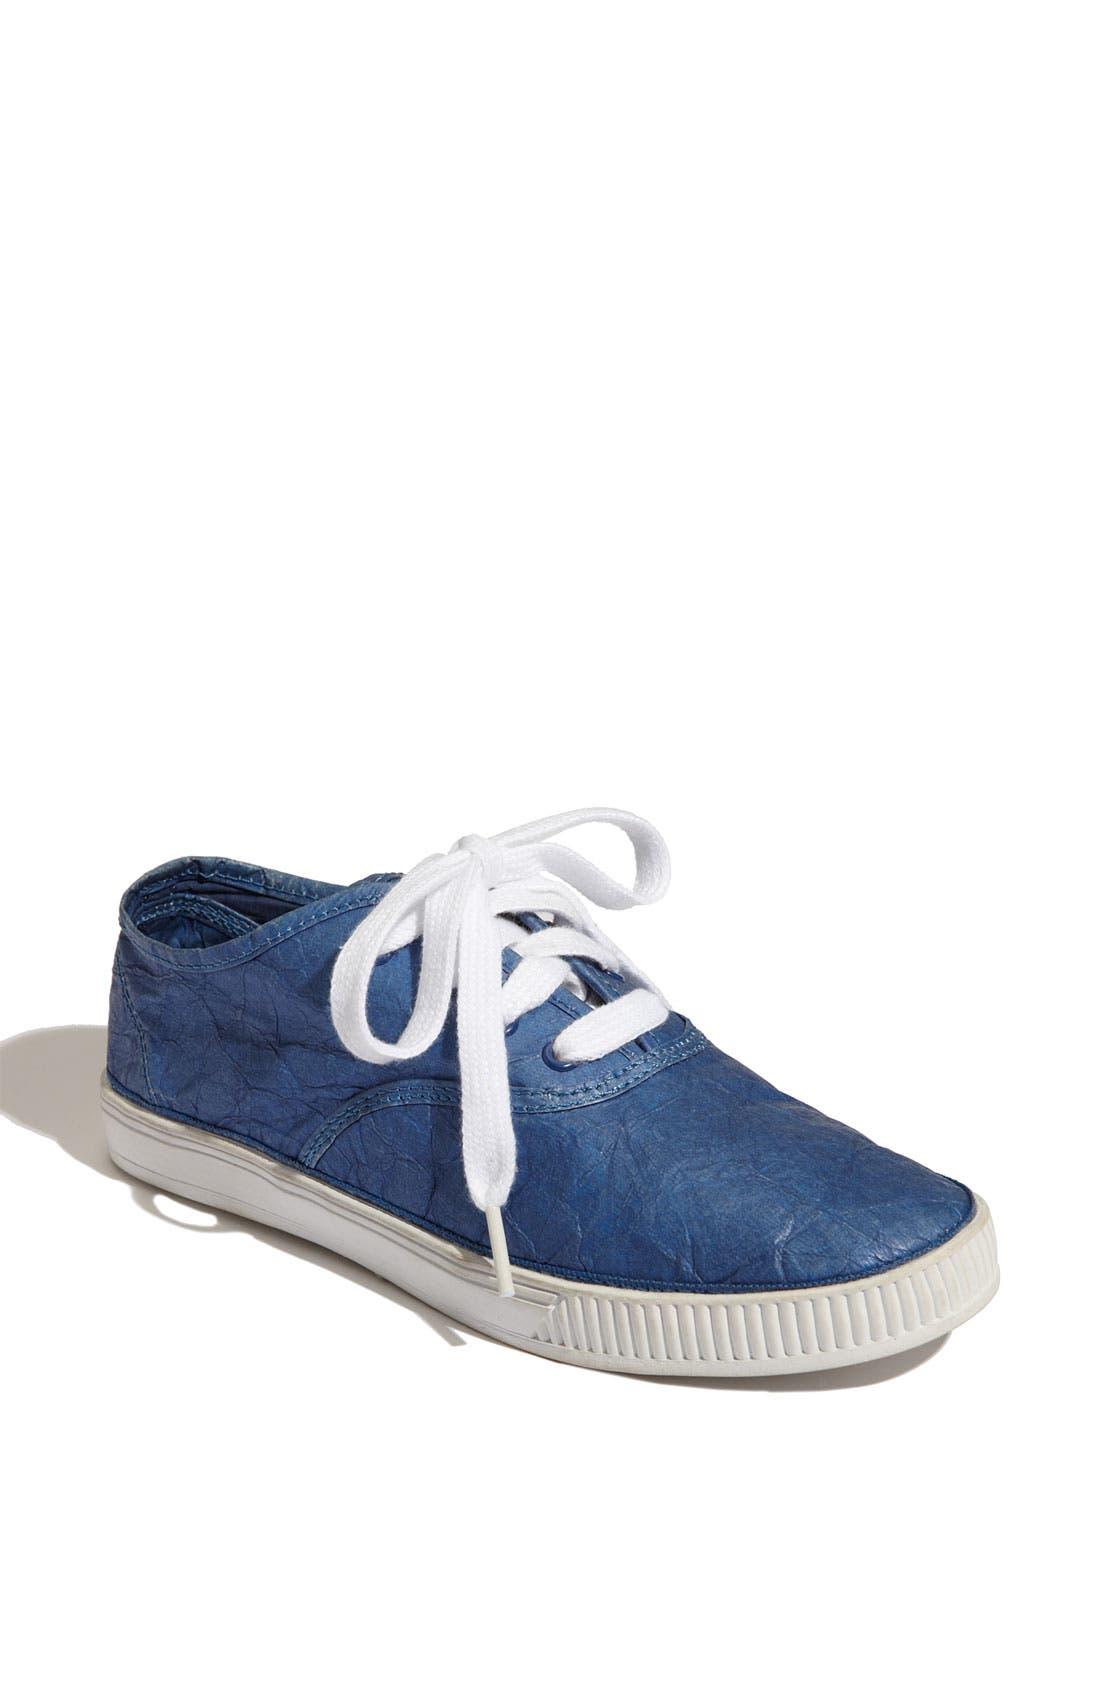 Main Image - Civic Duty 'Exhilaration' Sneaker